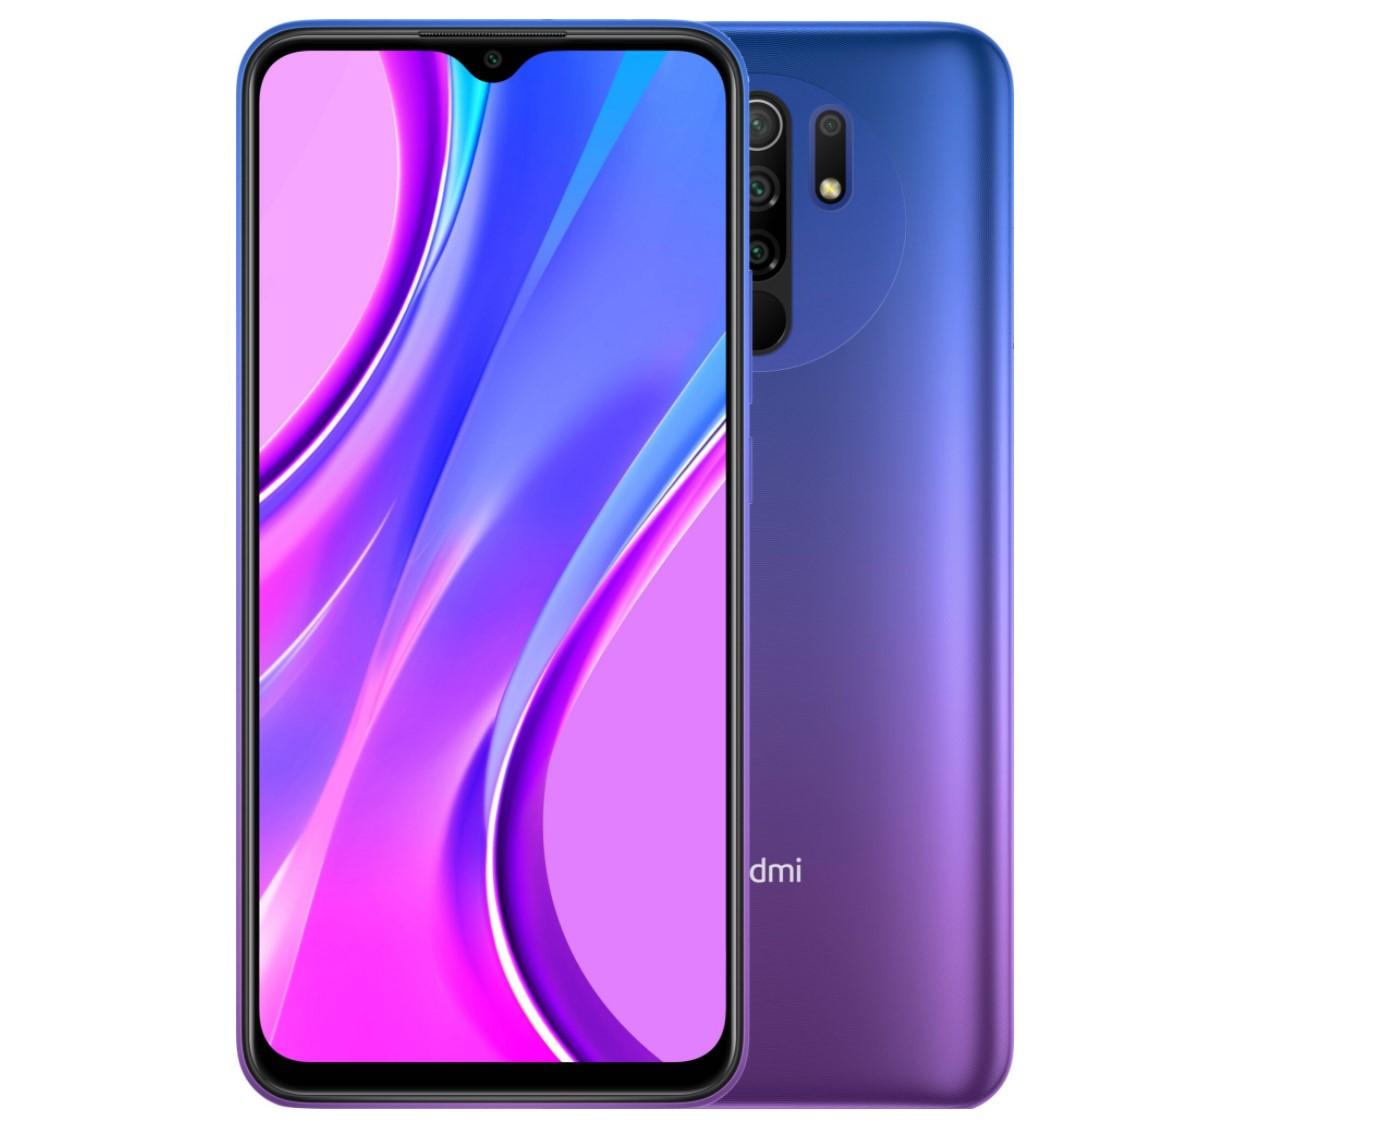 XIAOMI Redmi 9 fialový 4GB/64GB mobilní telefon (Sunset Purple, USB-C, 6.53in, 5020mAh, CZ distribuce), 28426